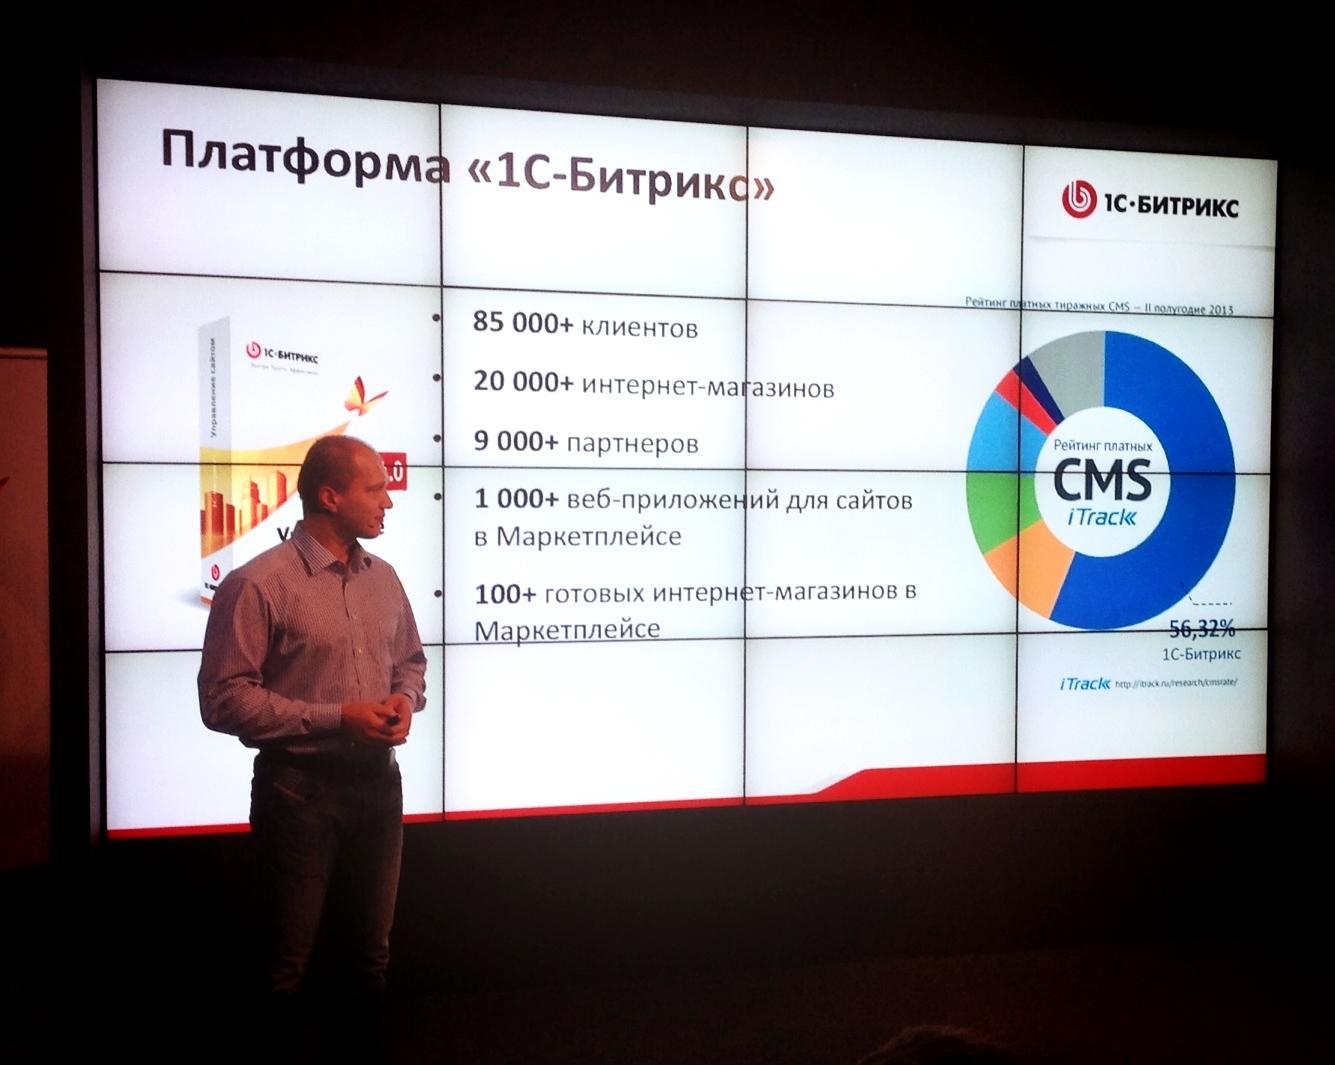 Статистика использования CMS 1С-Битрикс